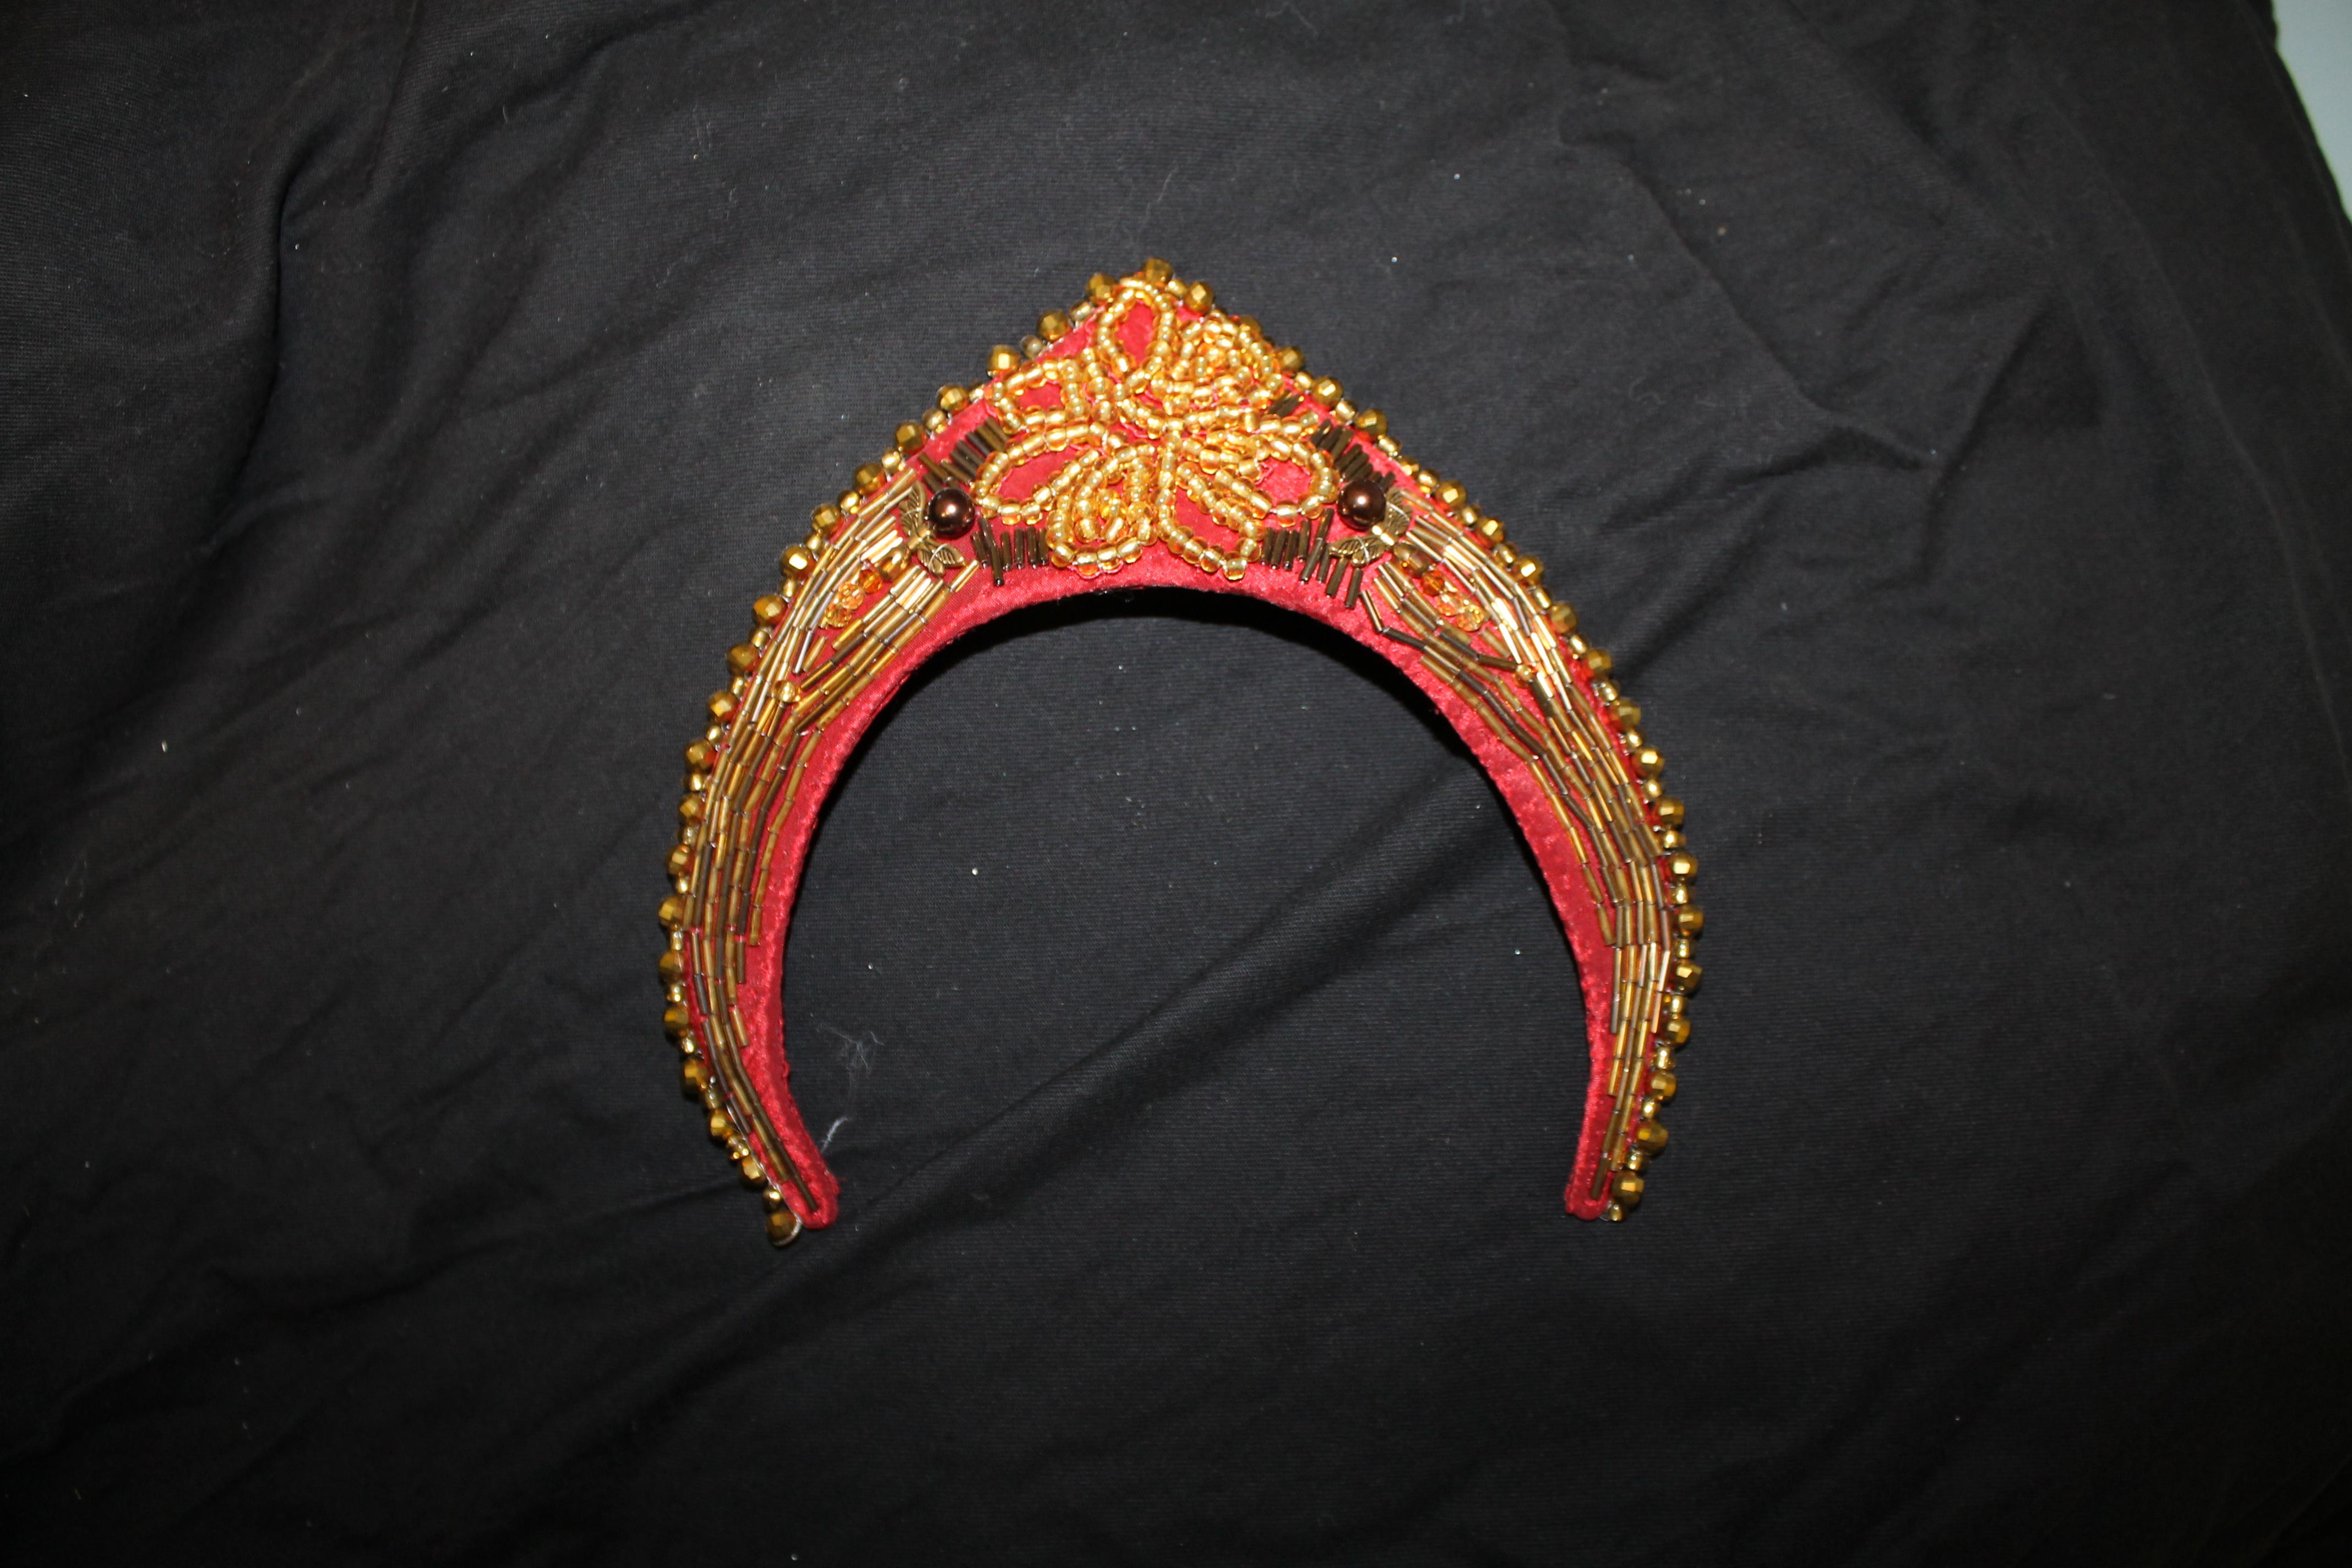 Beaded Headpiece - Front